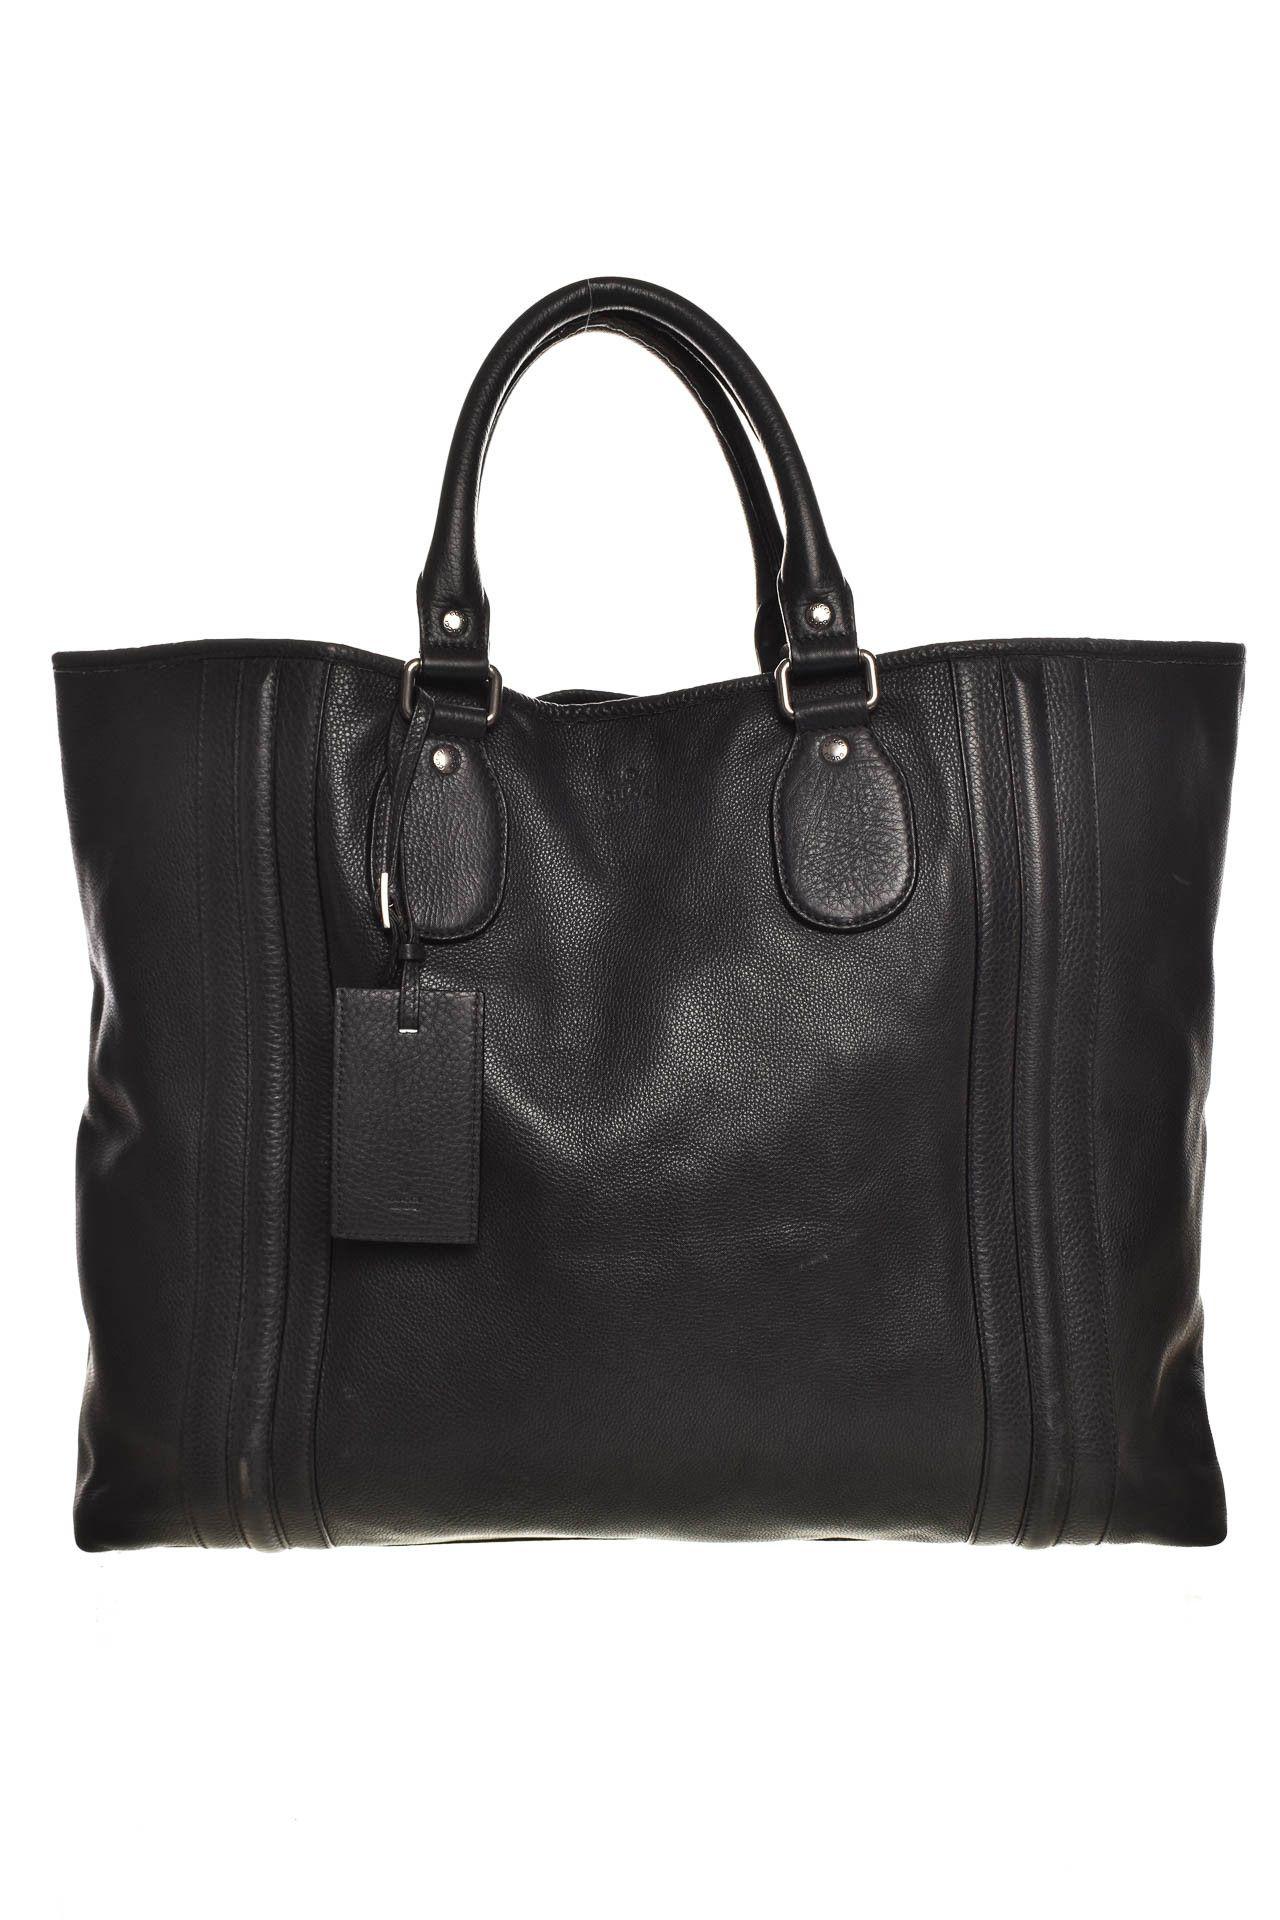 Gucci - Hand Bag Grafite - Foto 1